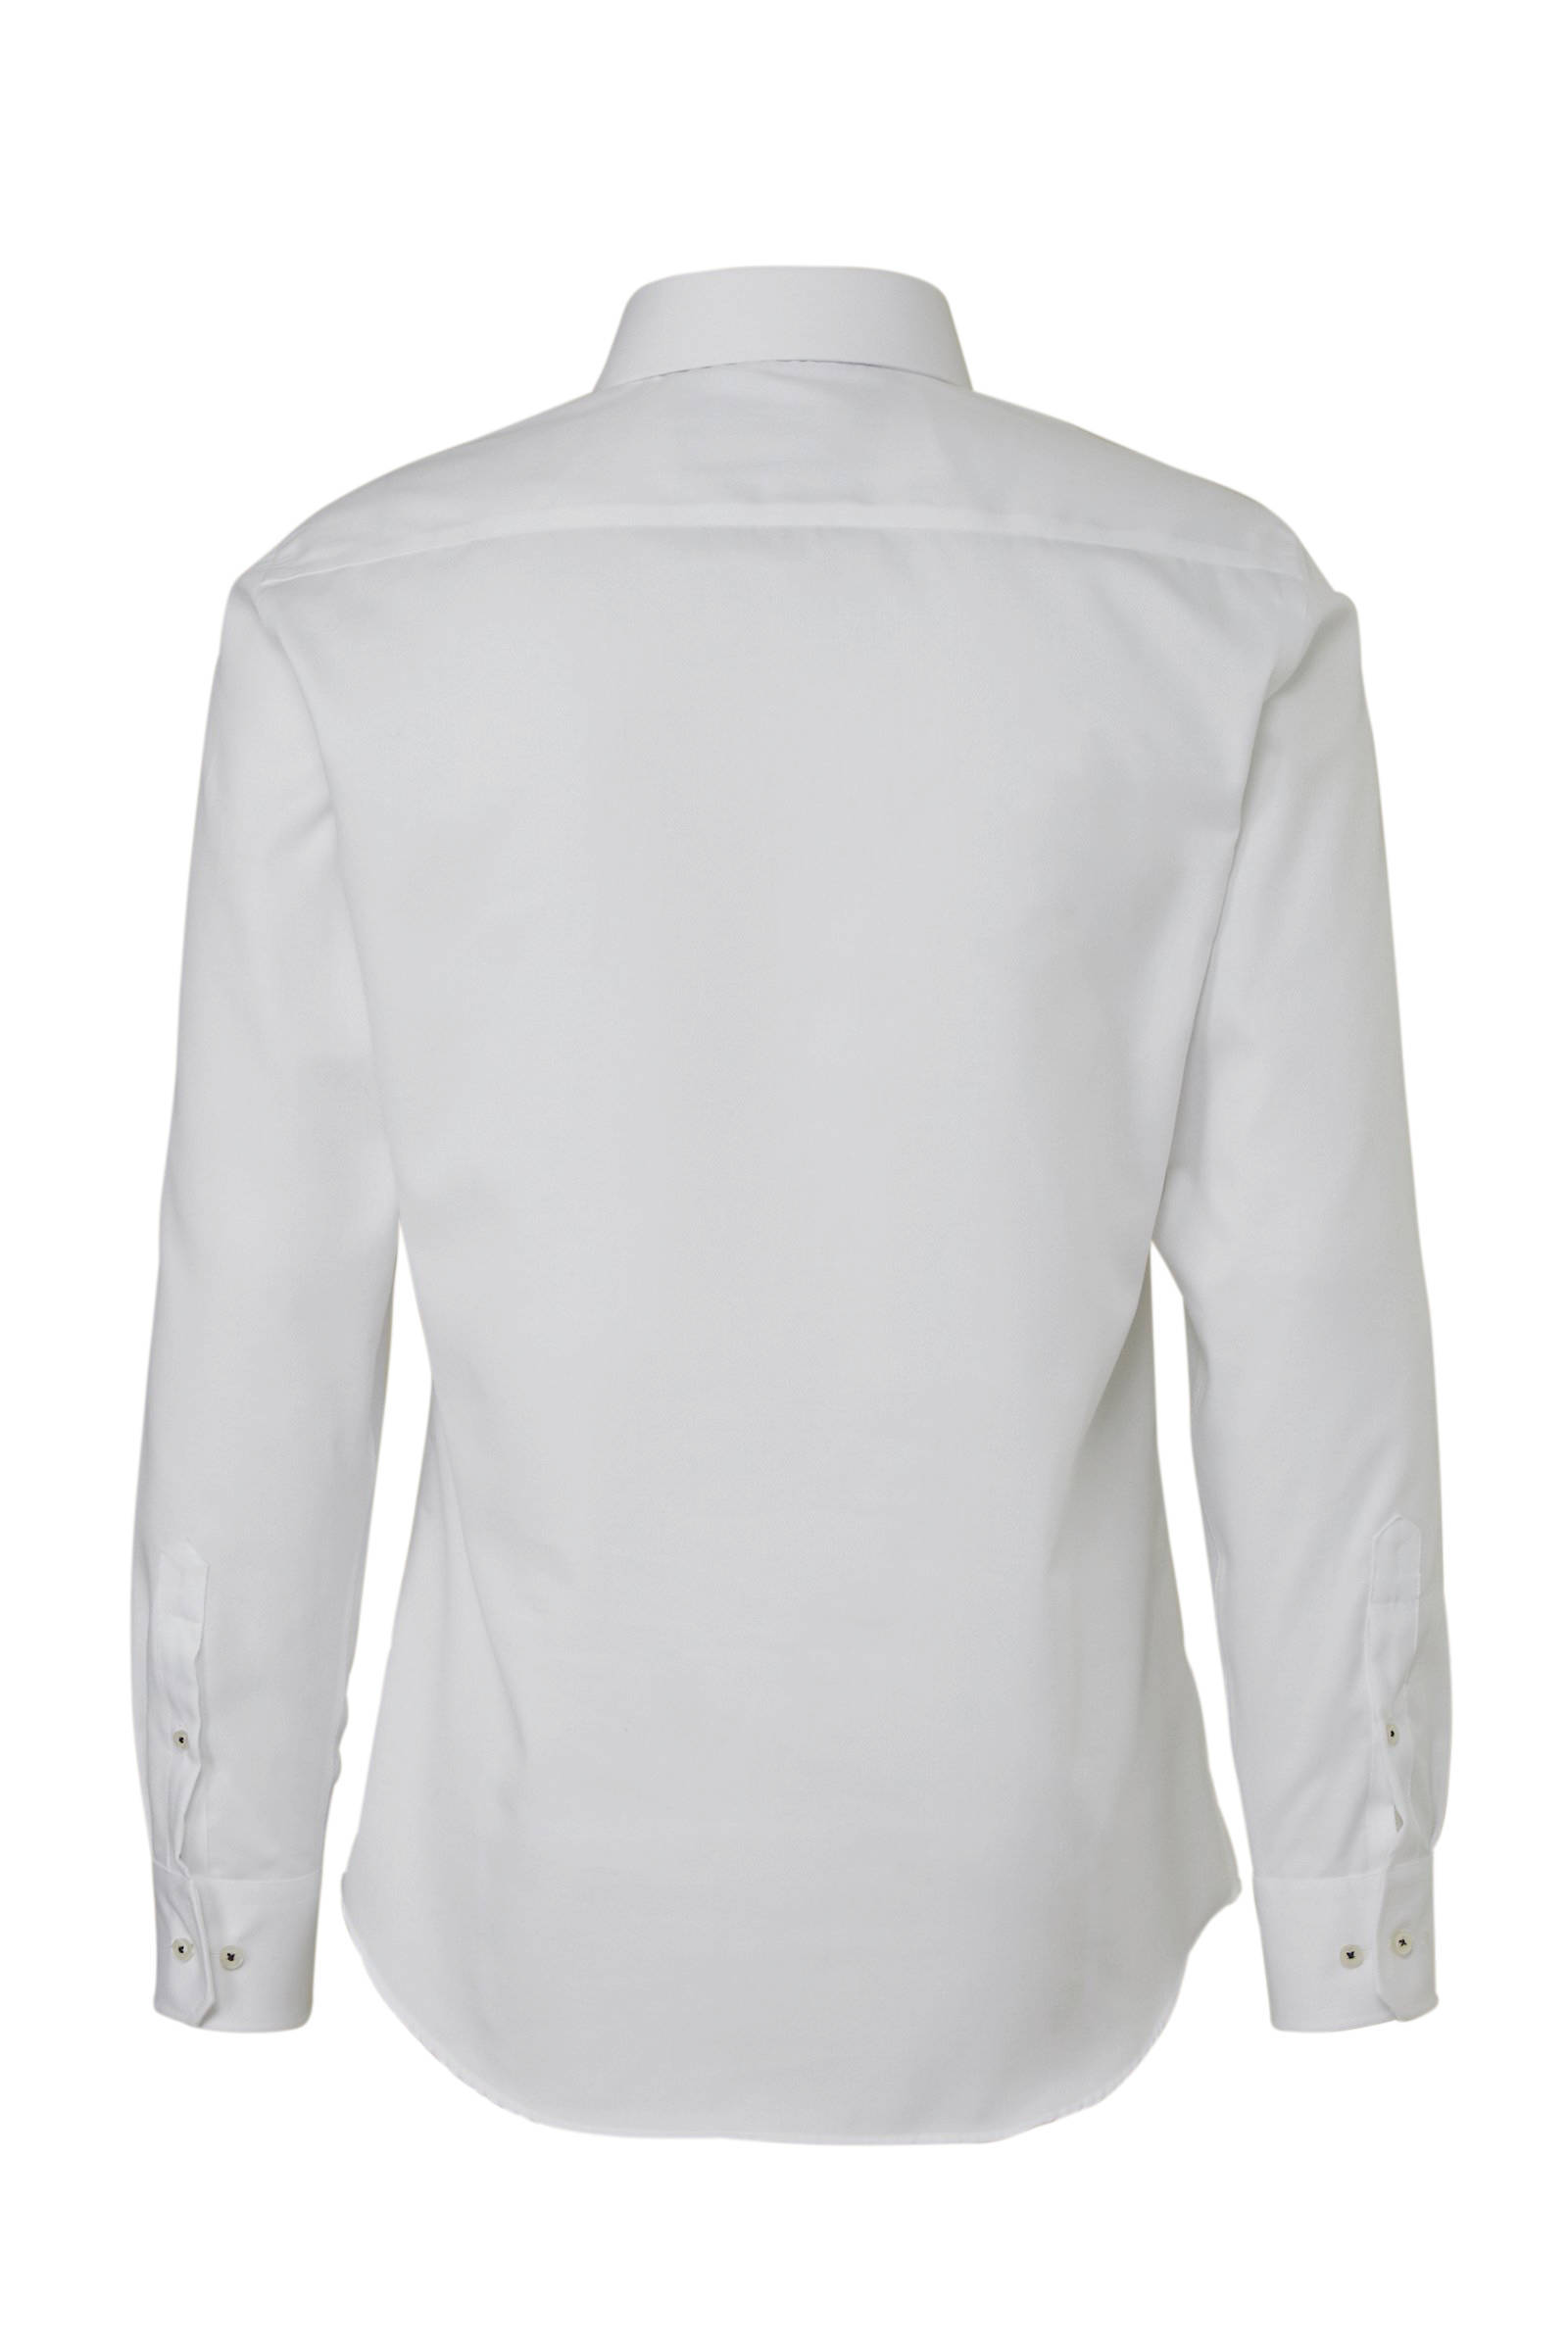 Michaelis overhemd fit slim overhemd fit slim Michaelis Michaelis wqFEH6q